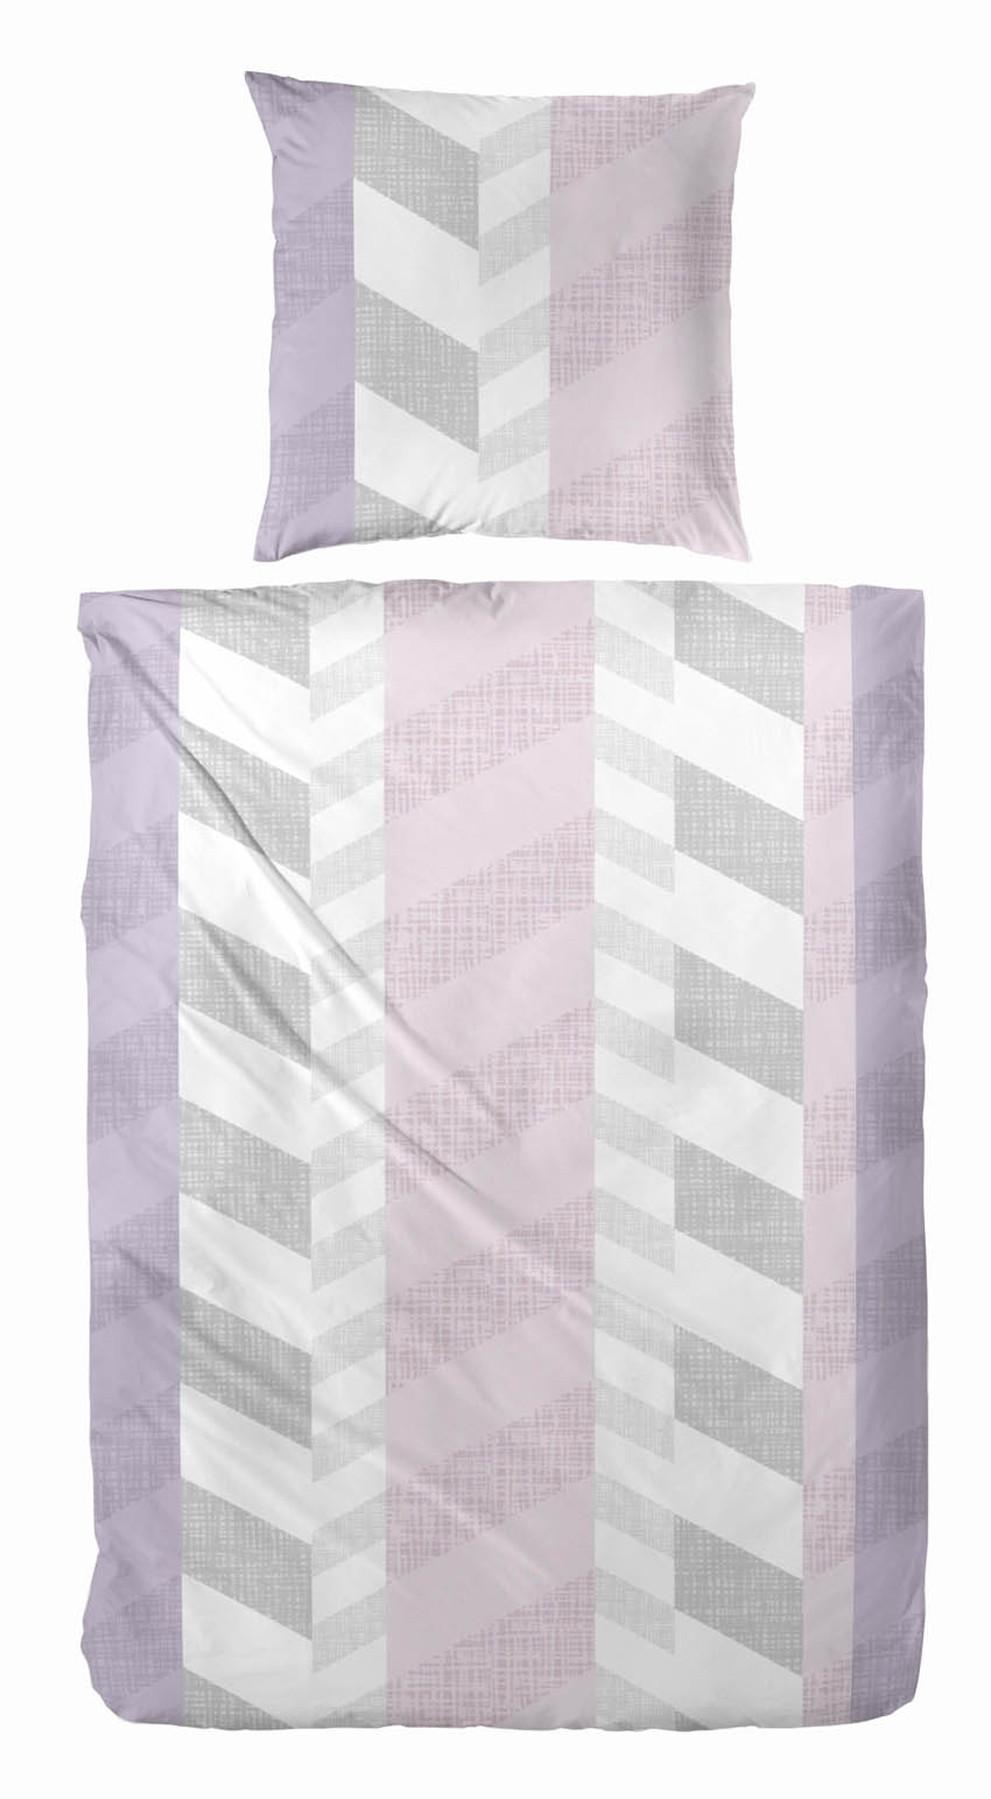 Fein Biber Bettwasche In Grau Rosa 135 X 200 80 X 80 Cm